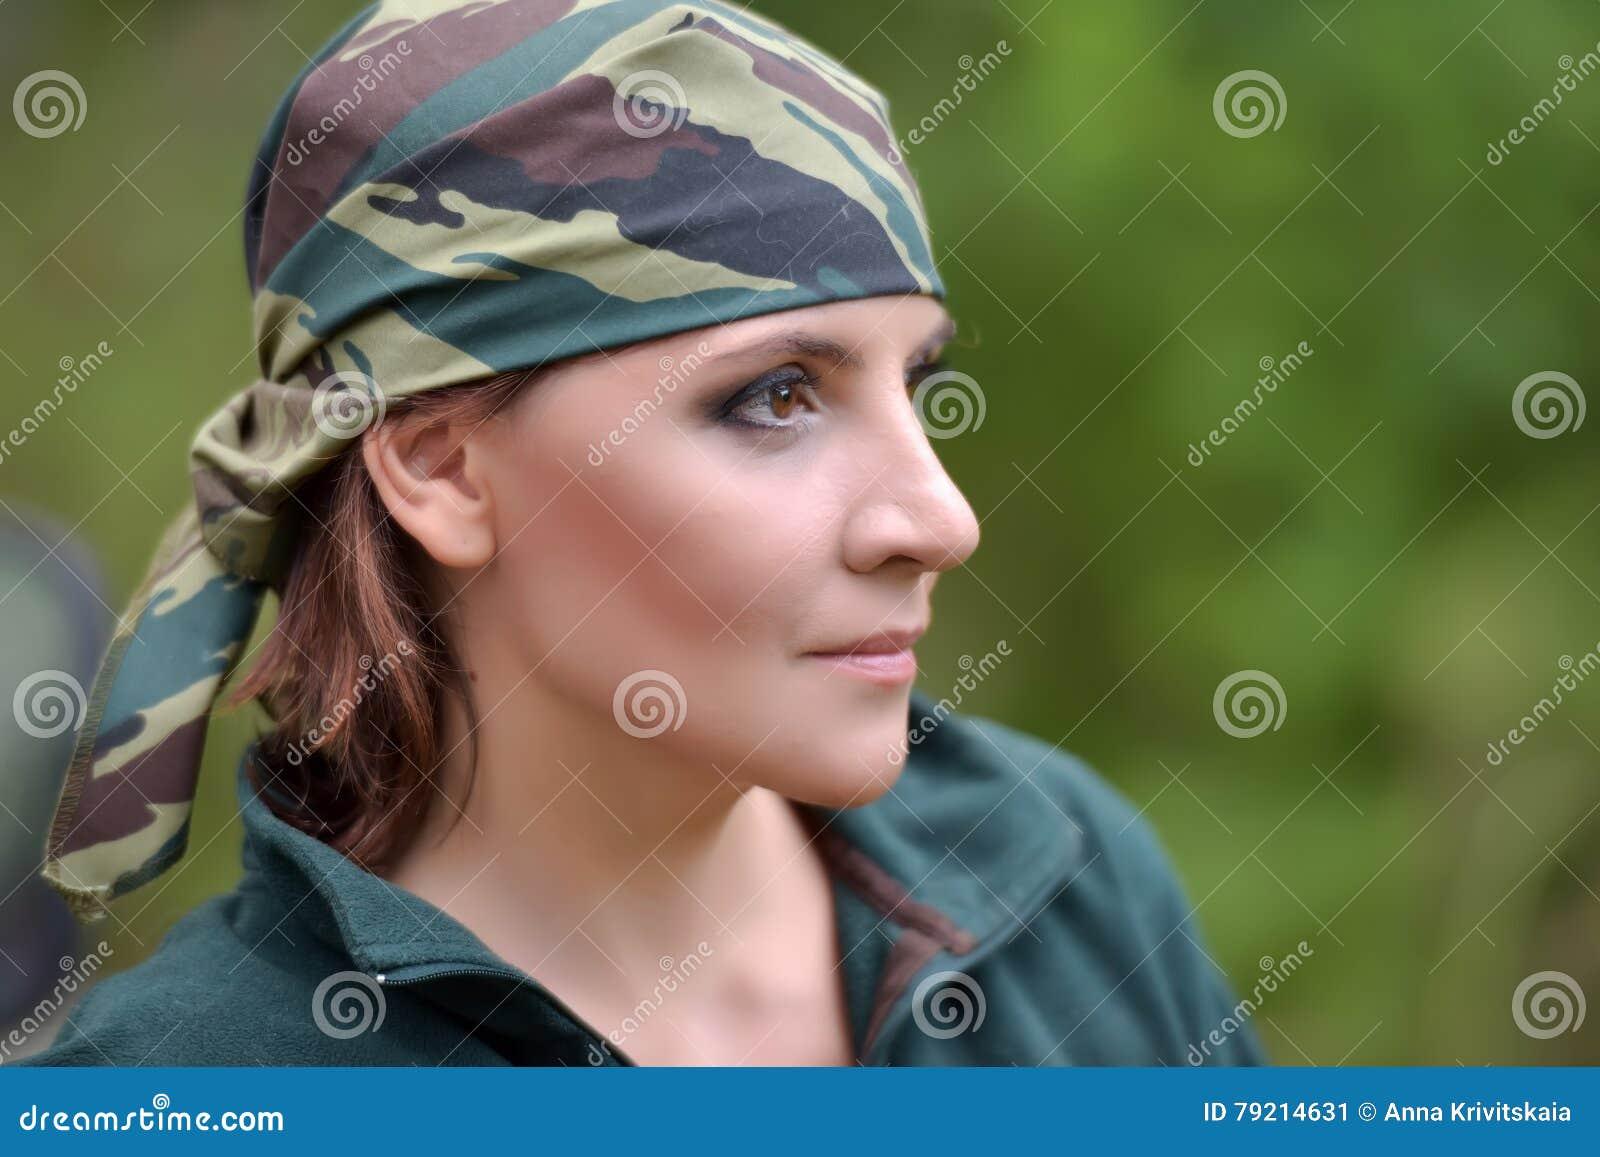 Woman wearing camouflage bandana against the backdrop of UAZ